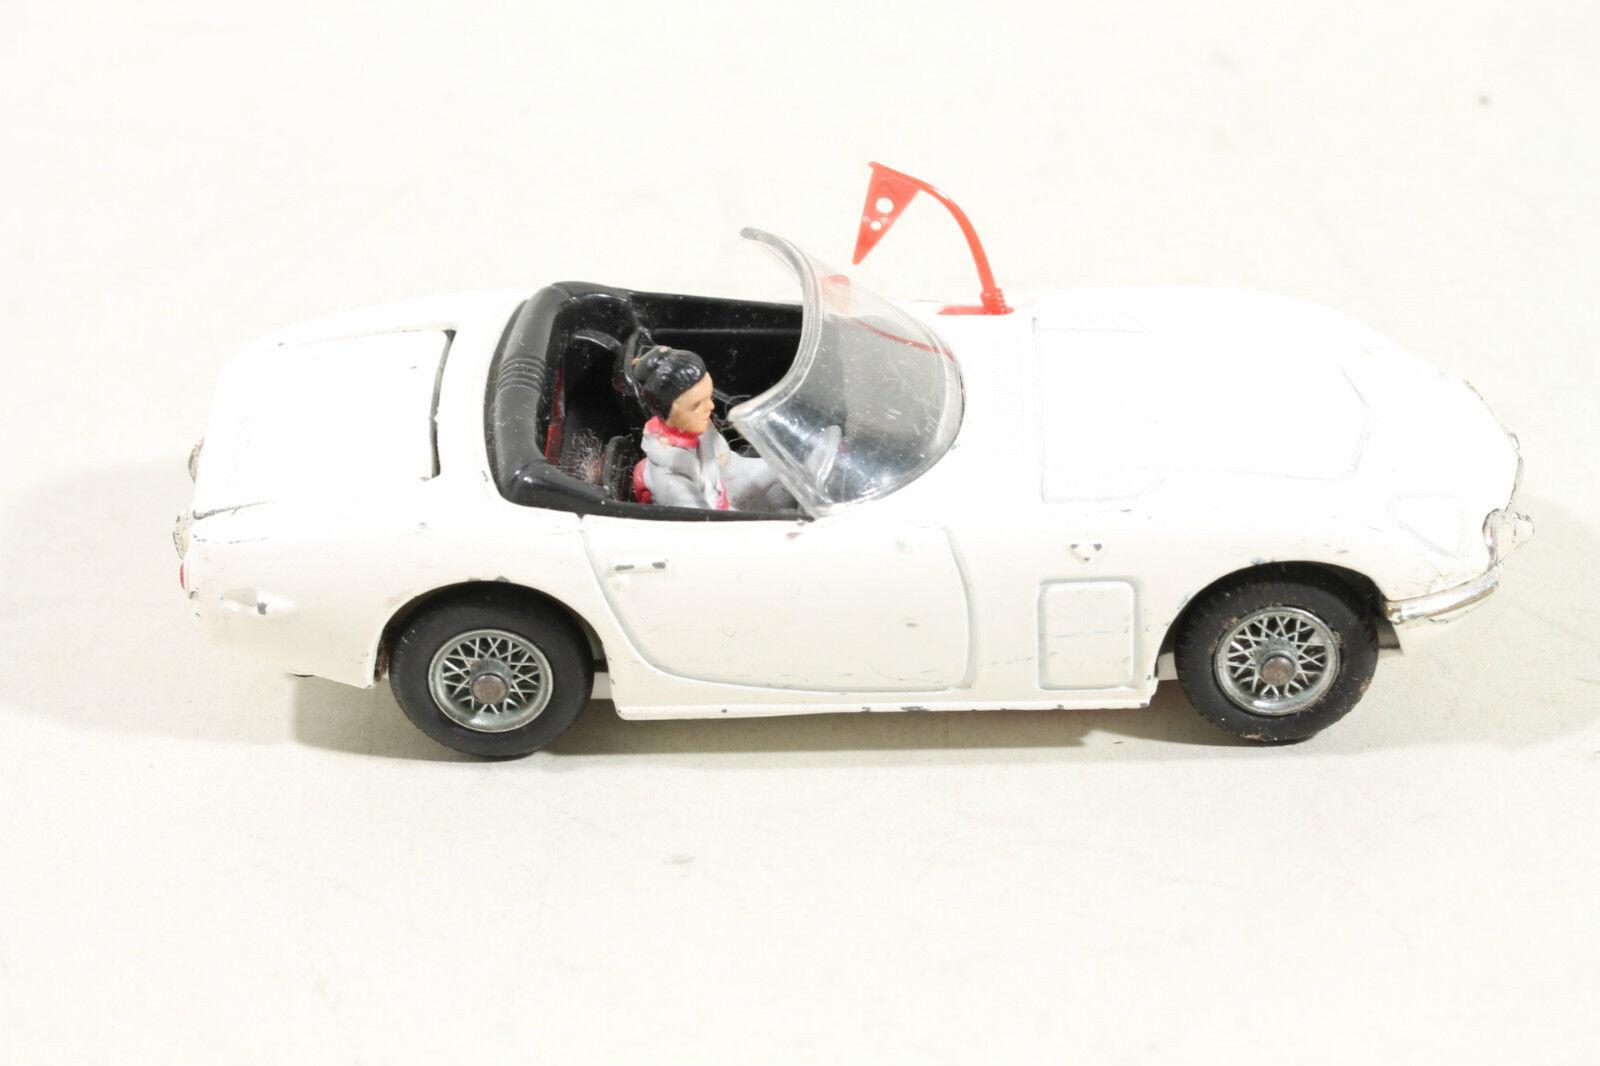 CORGI-TOYS JAMES BOND TOYOTA 2000 GT